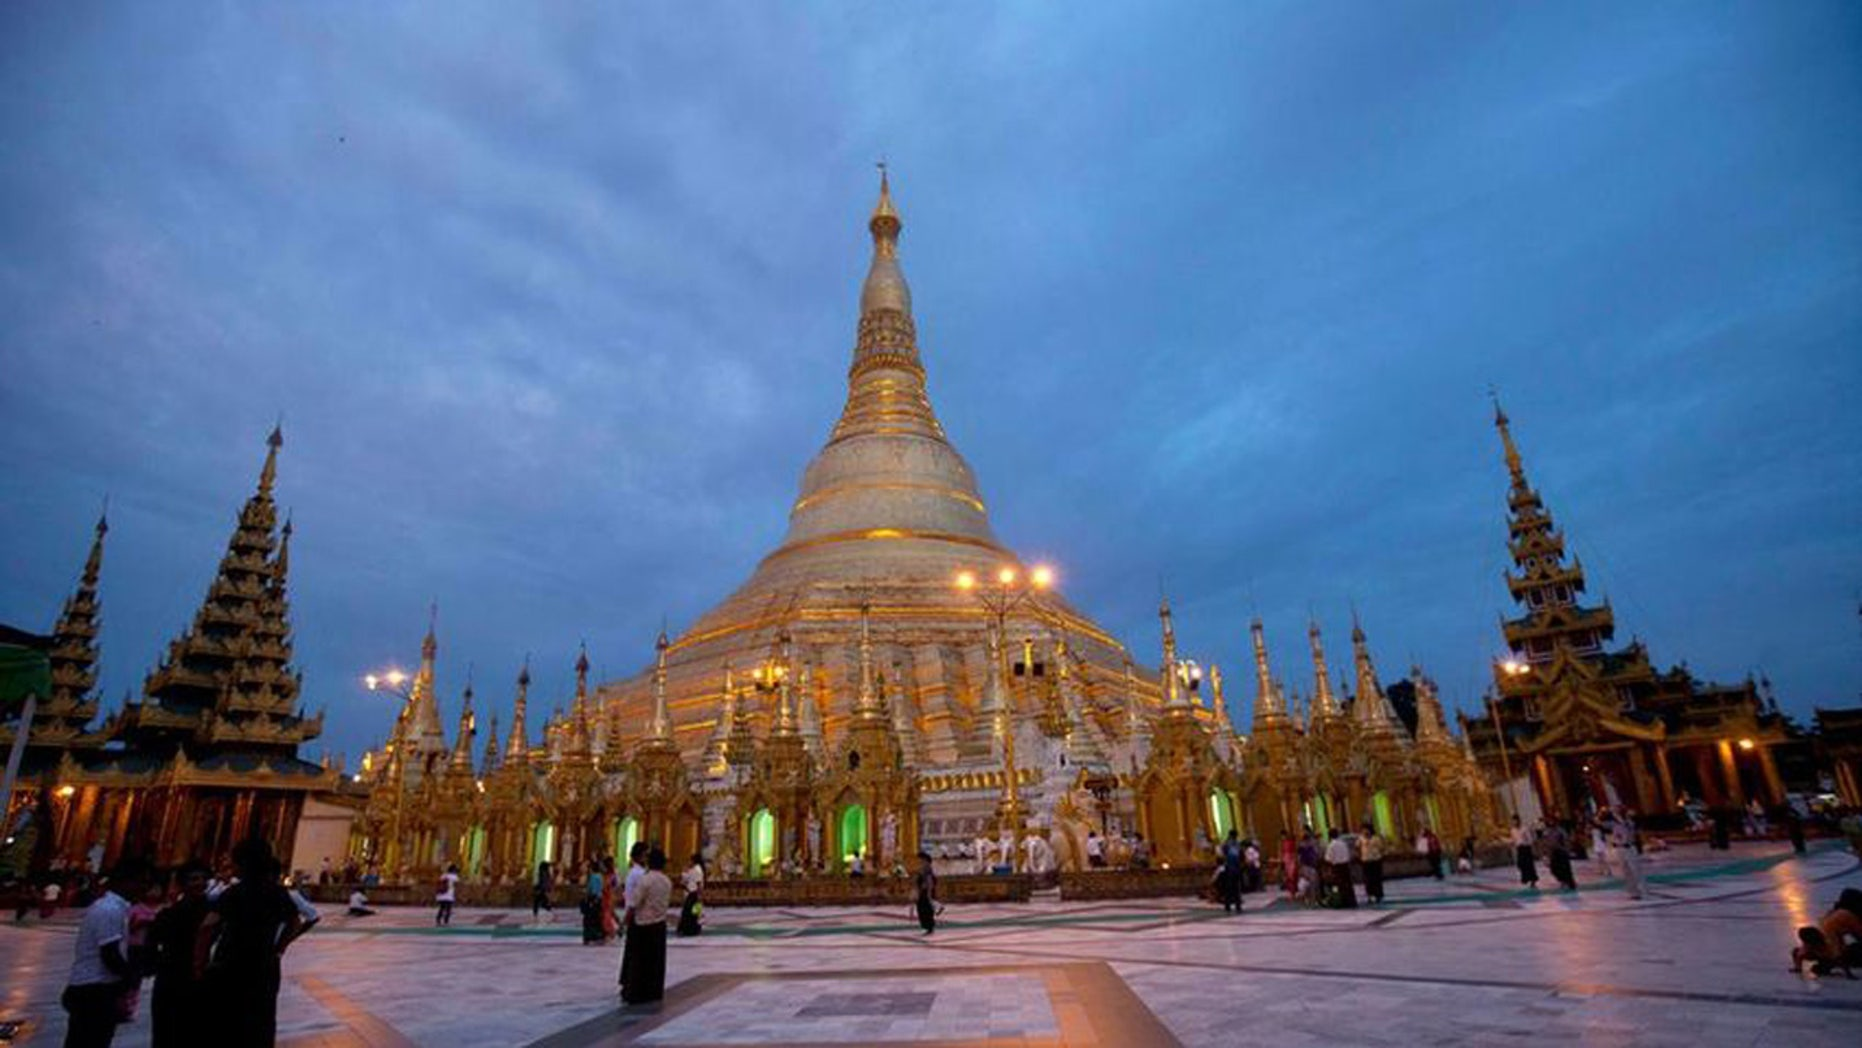 Buddhist devotees visit Myanmar's famous Shwedagon Pagoda as its illuminated in Yangon, Myanmar on Aug. 13, 2014.